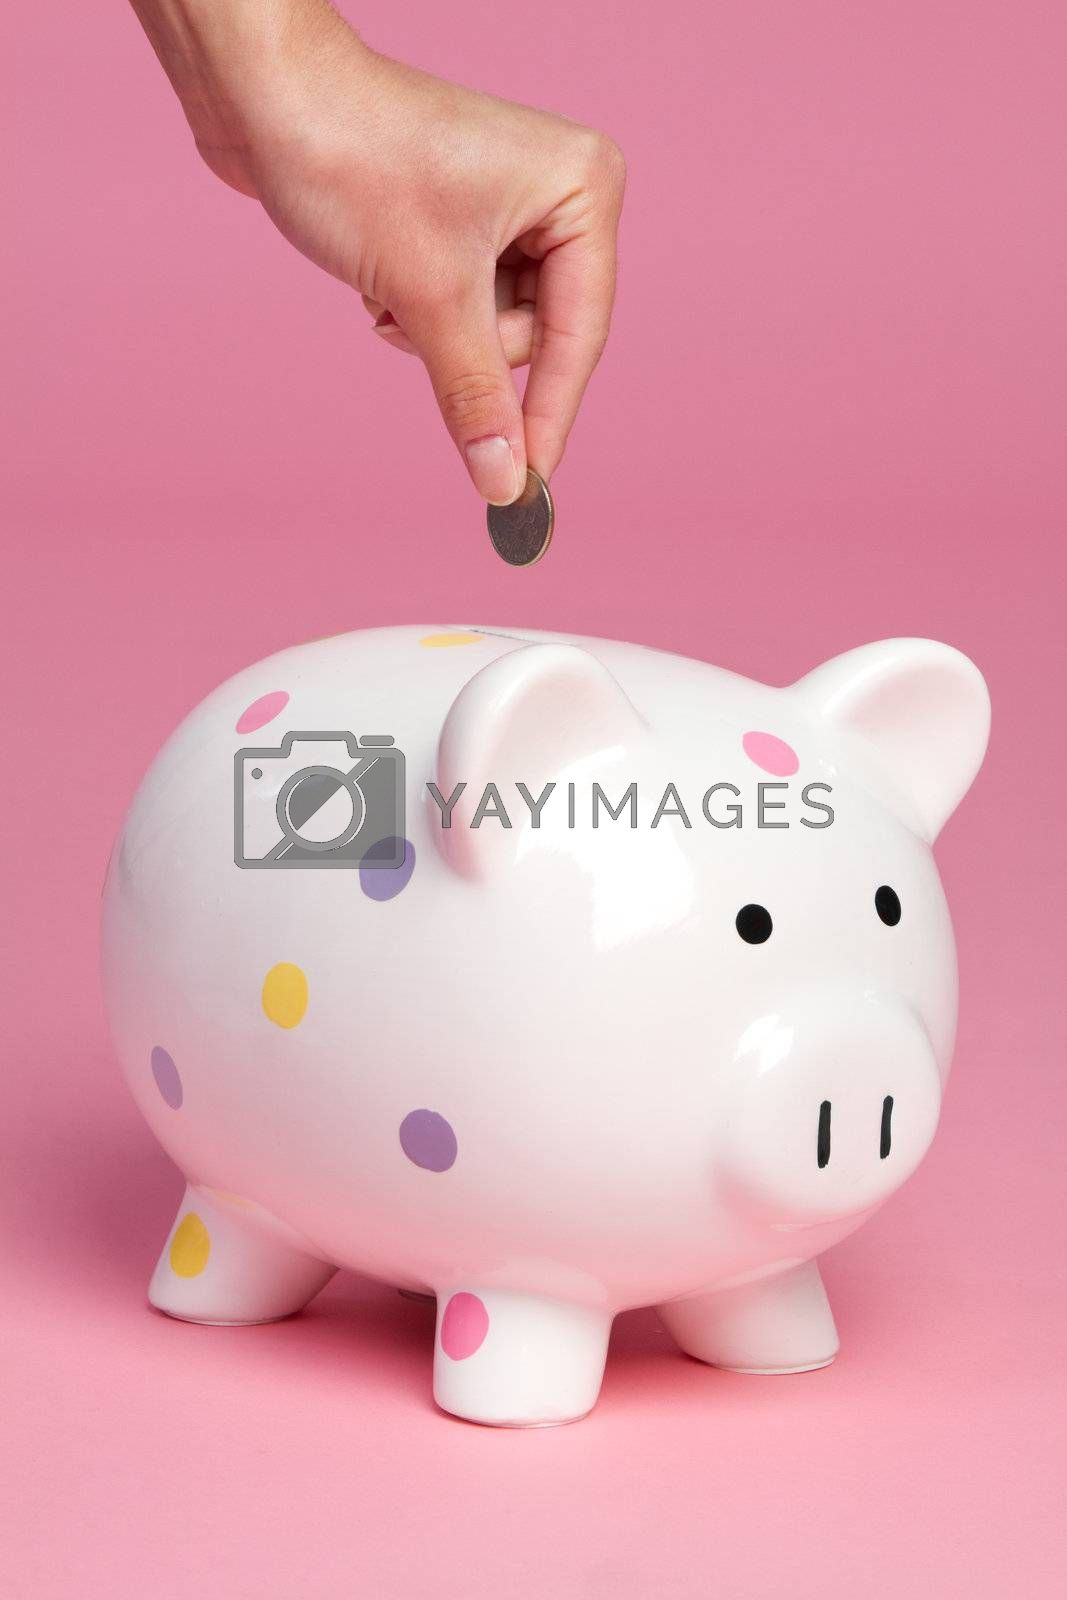 Person dropping coin into piggy bank